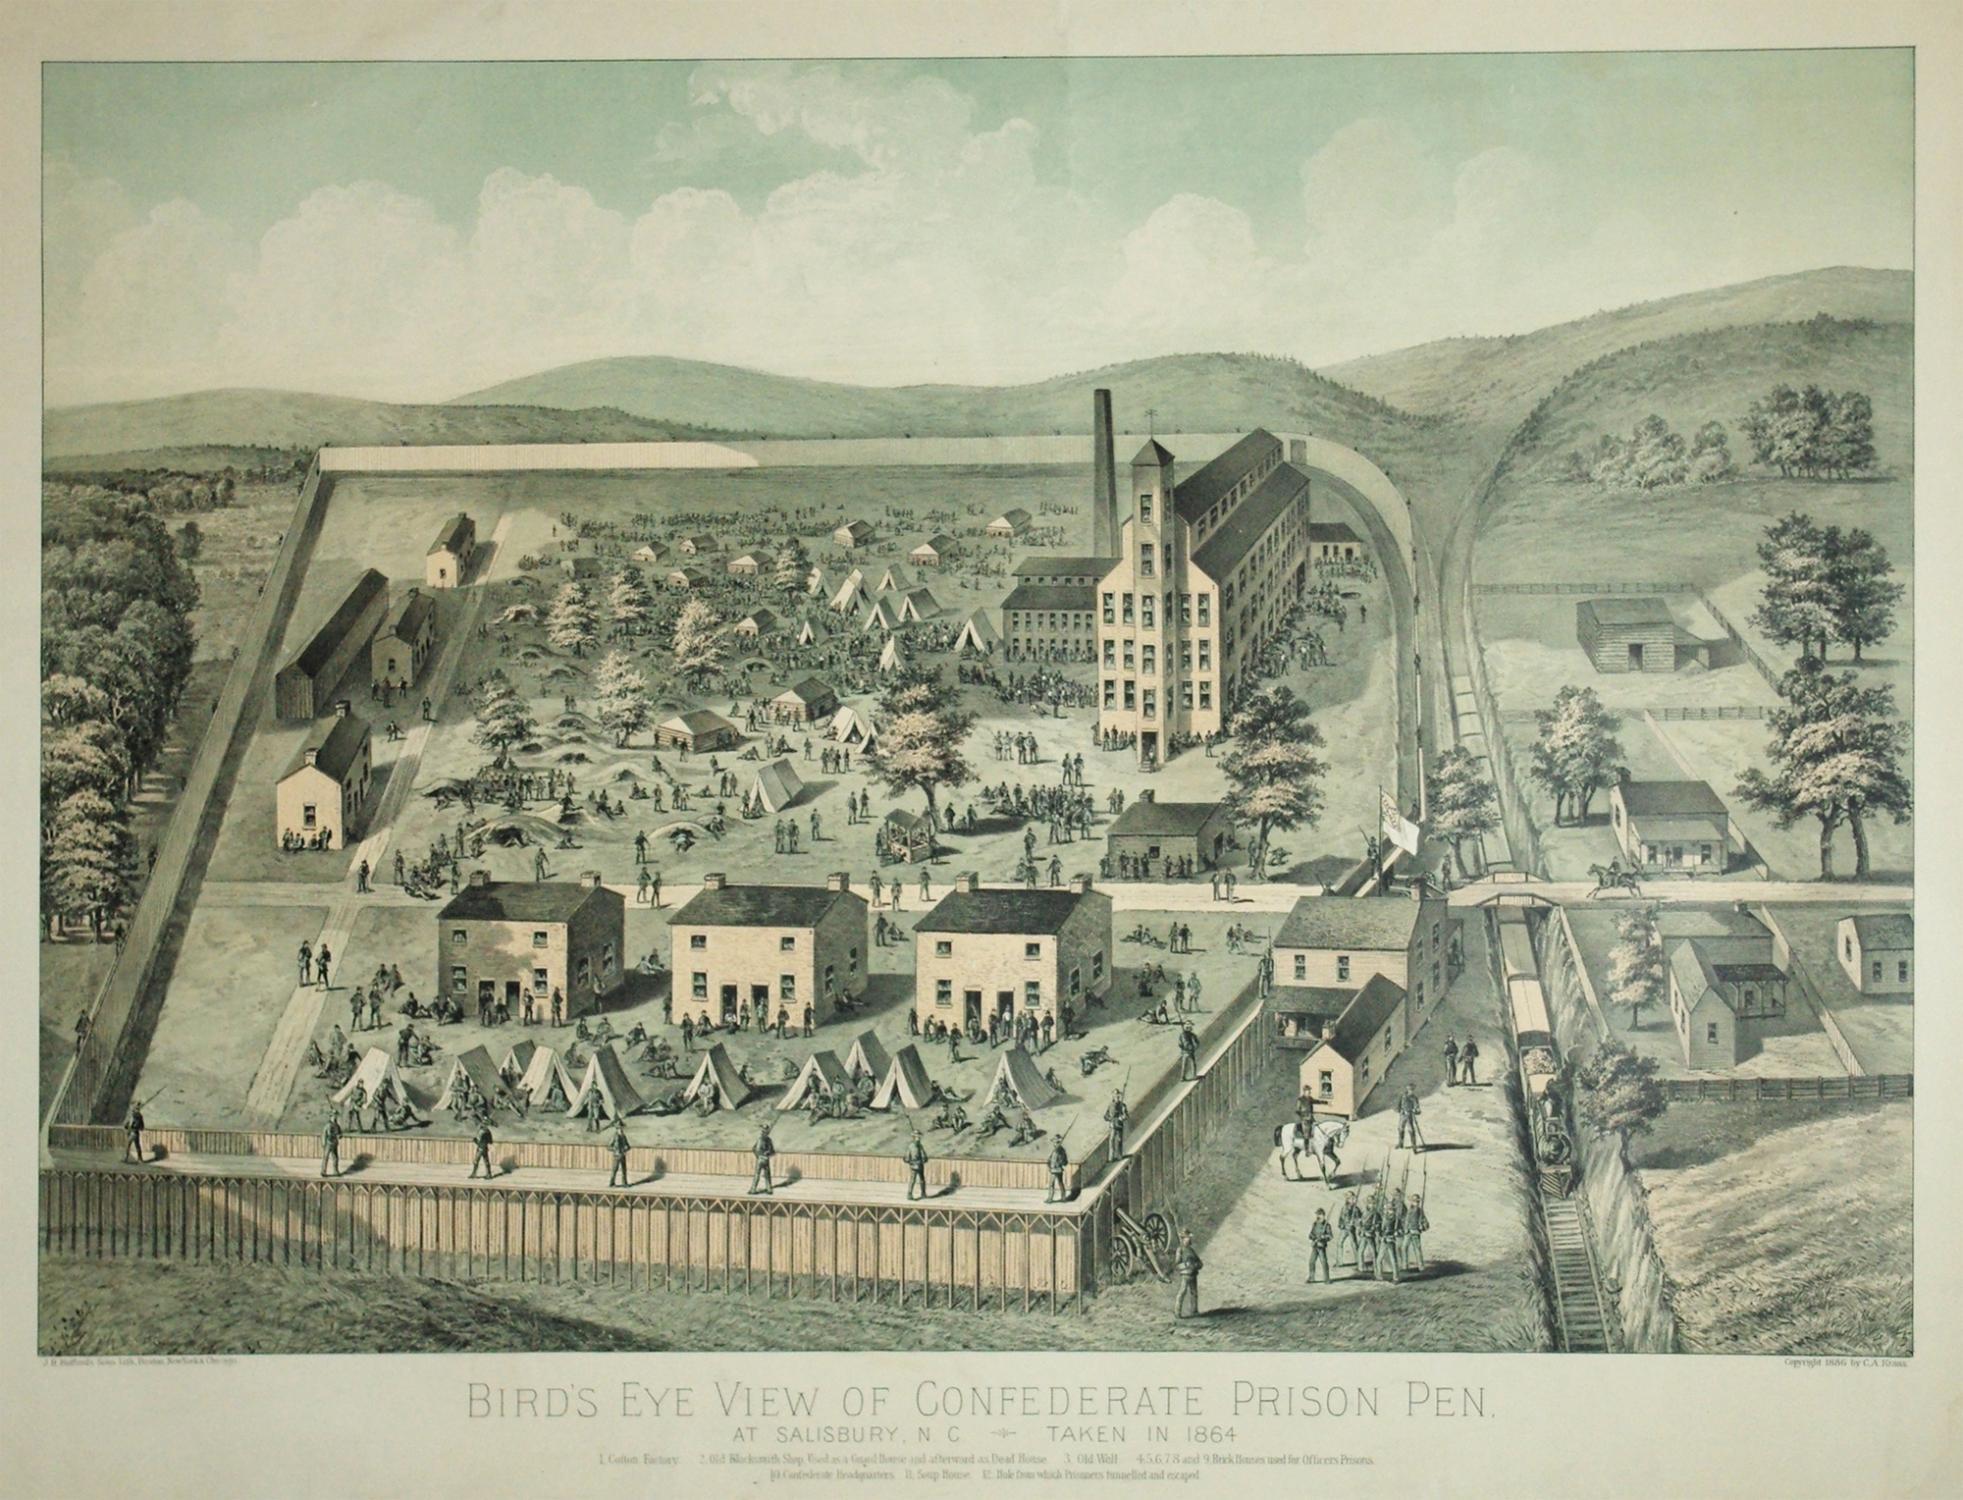 Bird's Eye View of Confederate Prison Pen.: John Henry Bufford